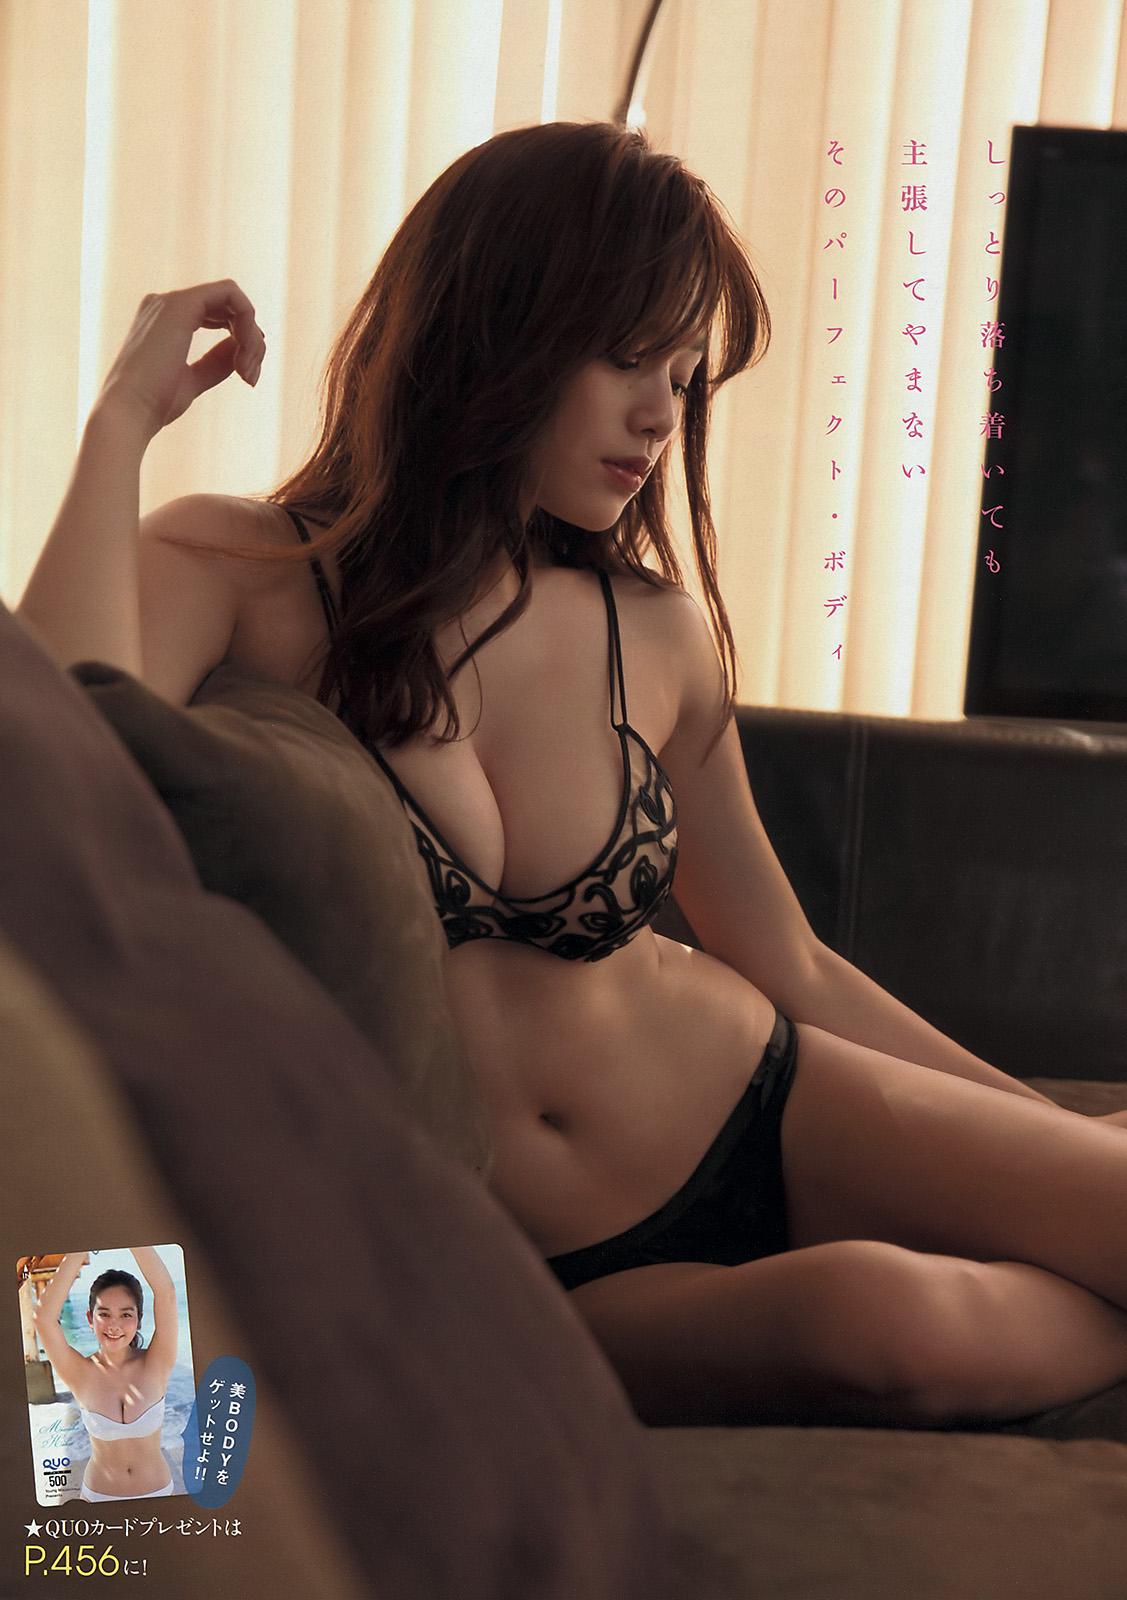 Kakei Miwako, Magazine, Young Magazine